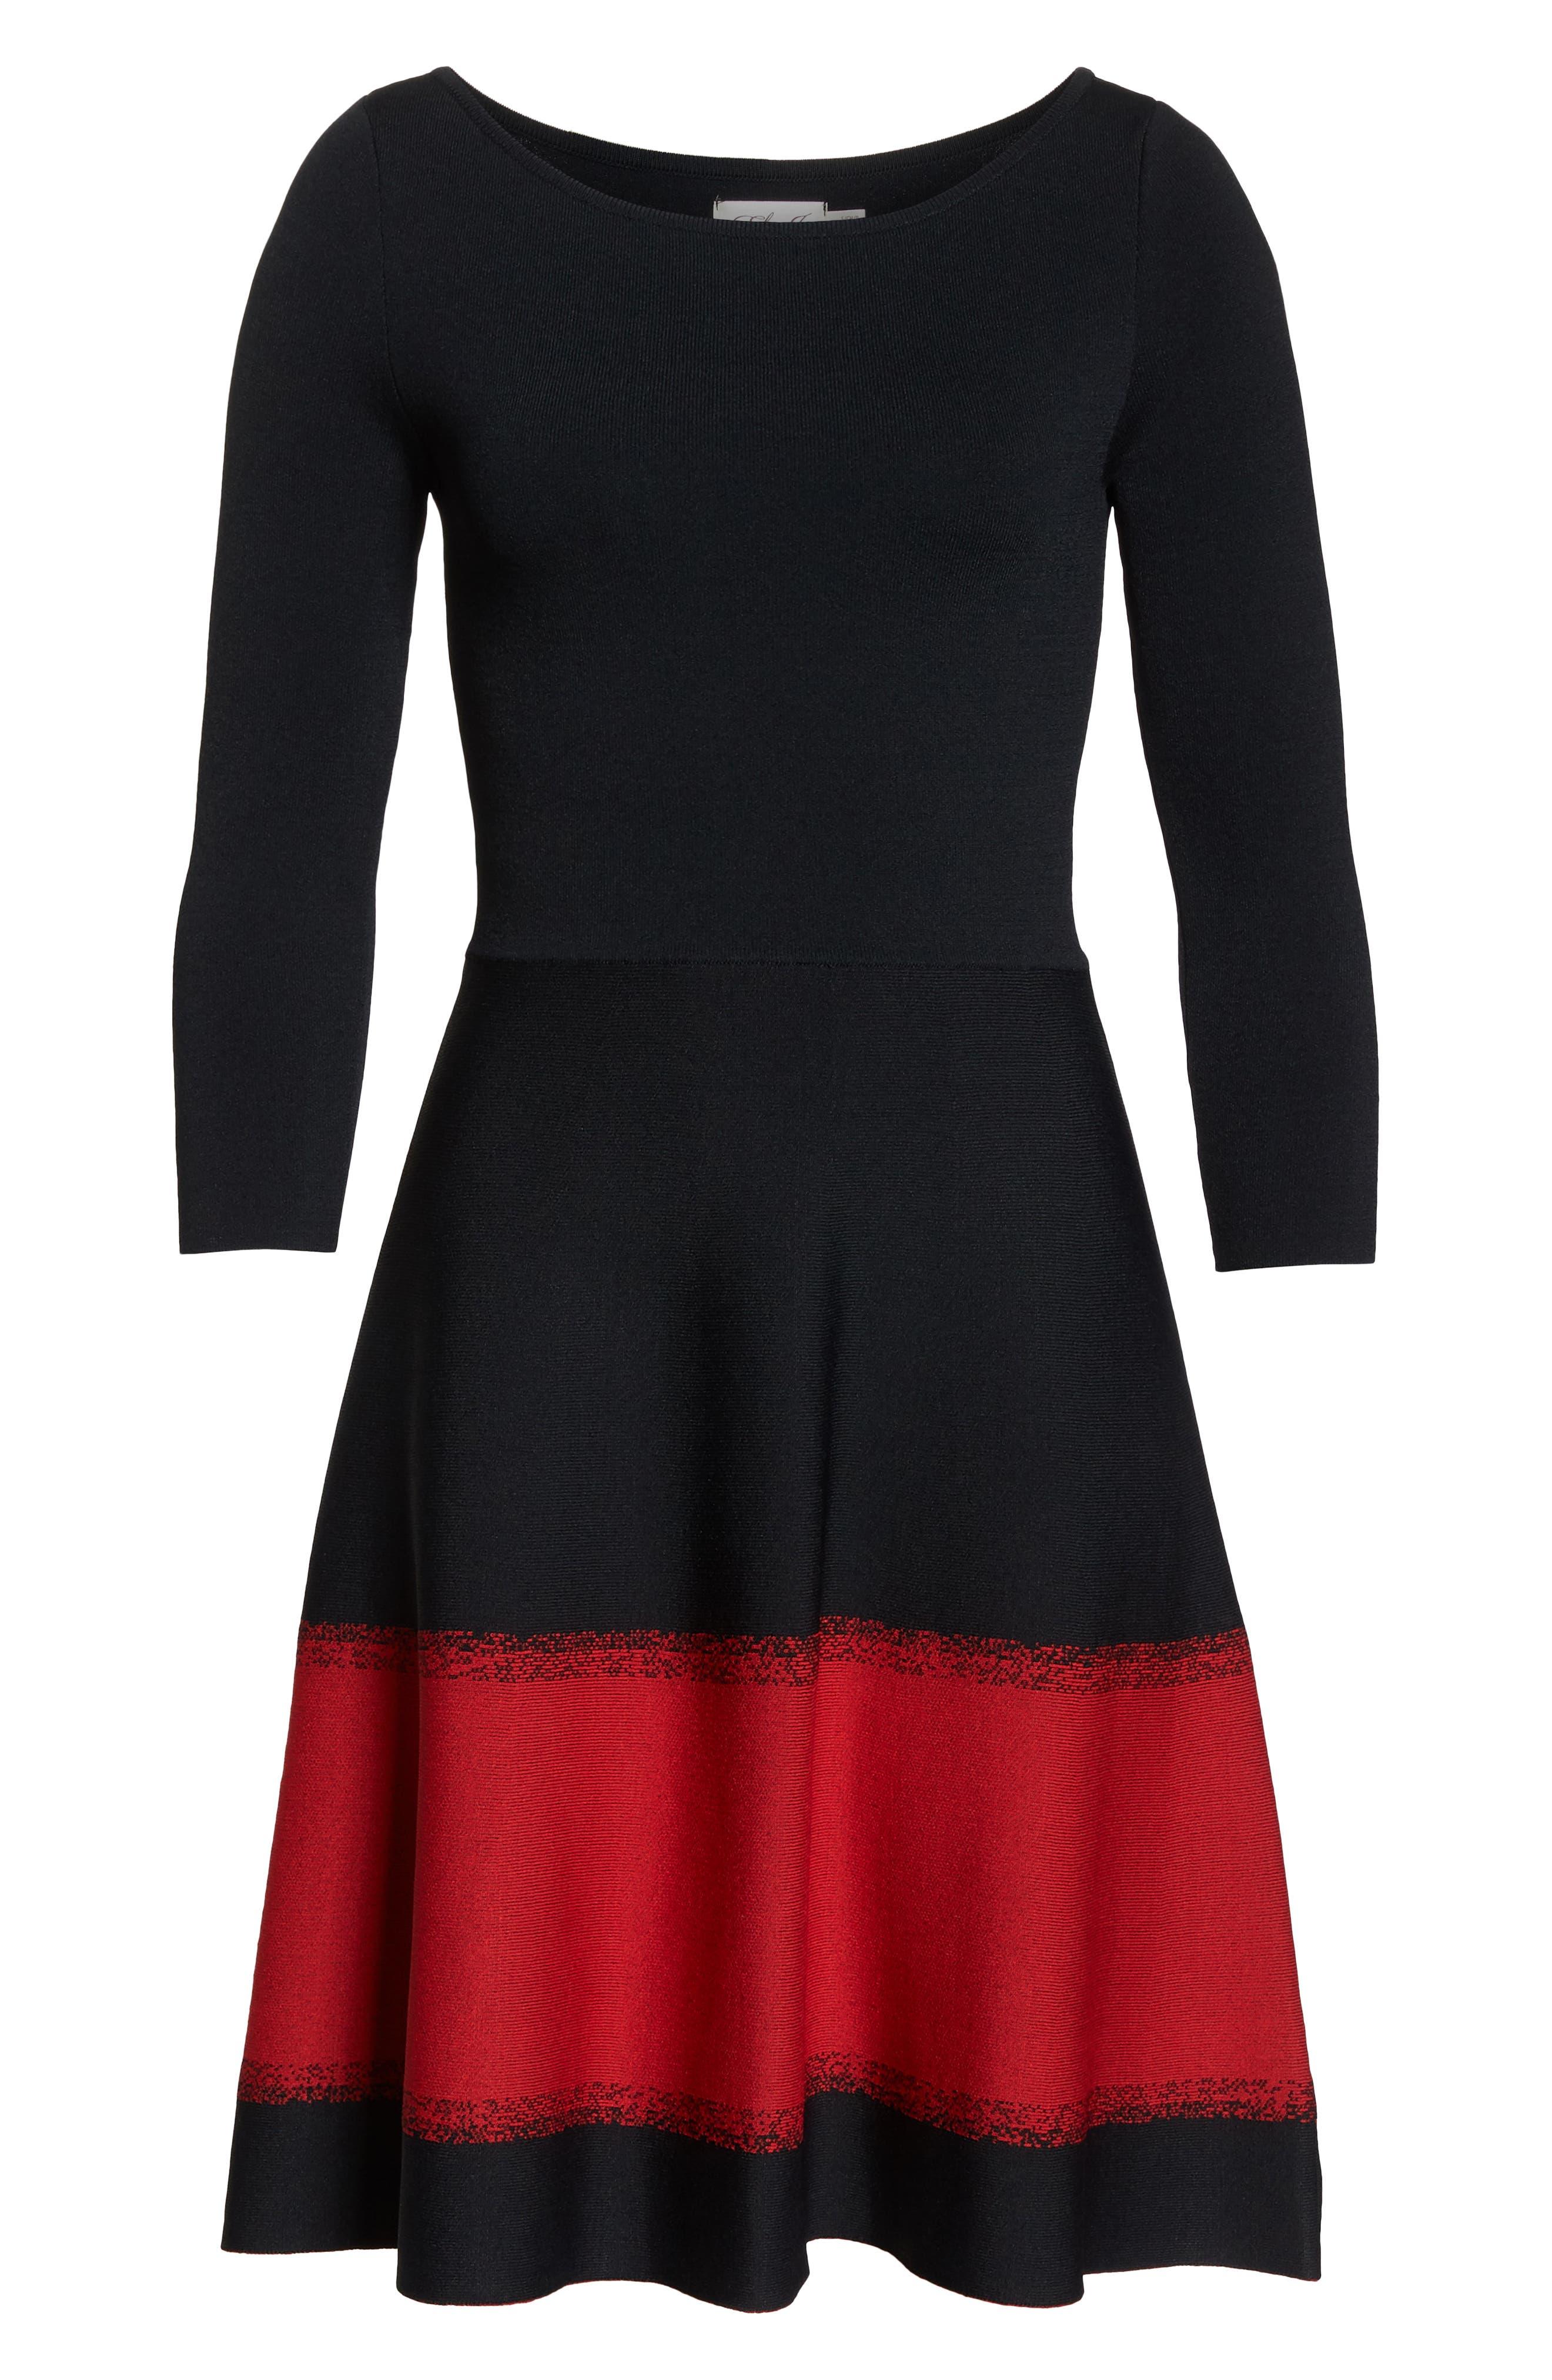 ELIZA J, Contrast Stripe Fit & Flare Dress, Alternate thumbnail 7, color, 001